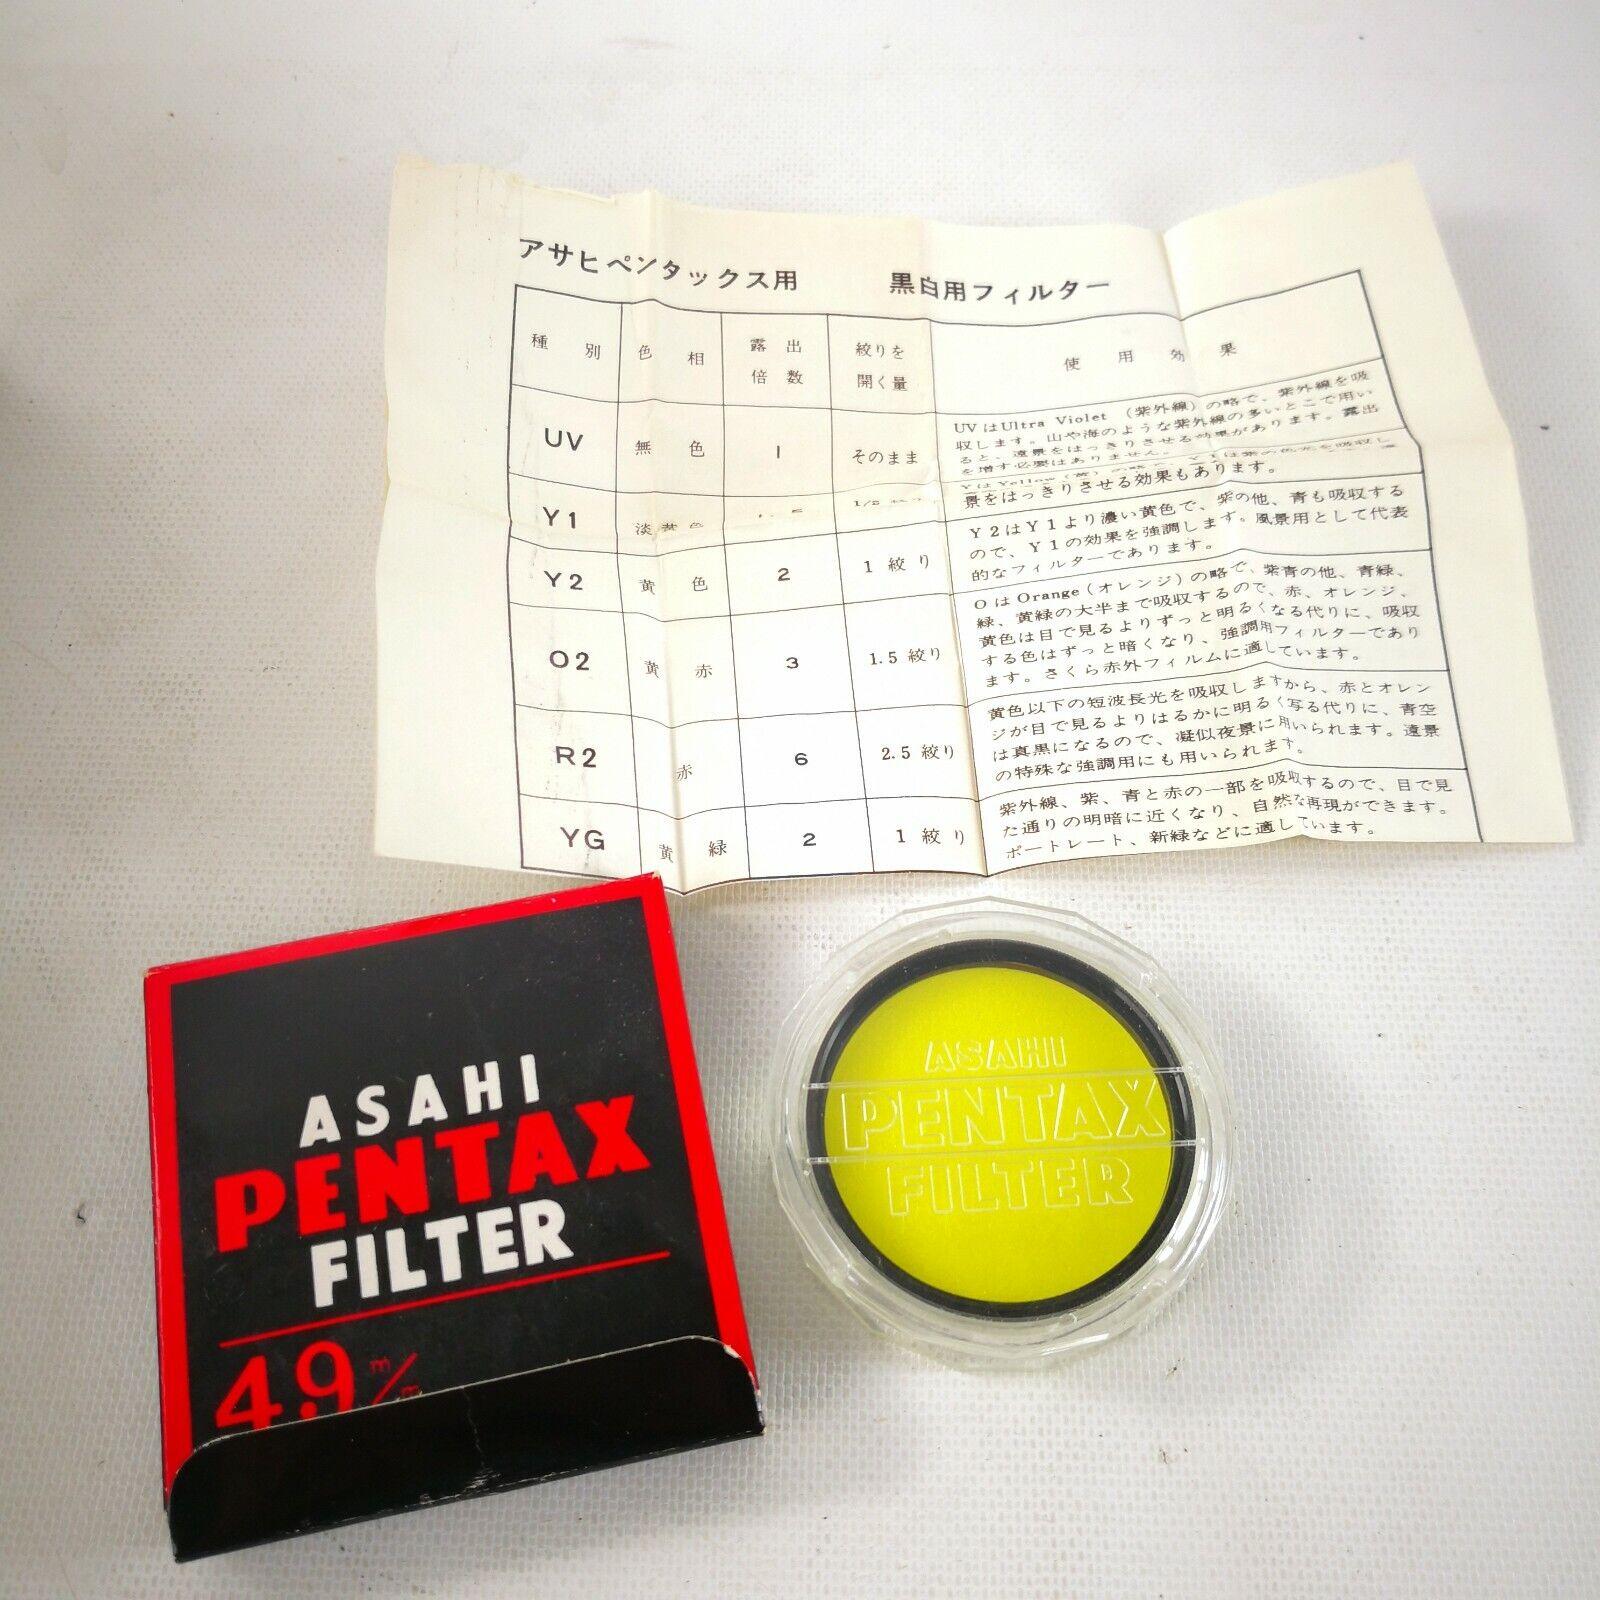 Asahi Pentax 49mm Y 2 Filter  - $9.99